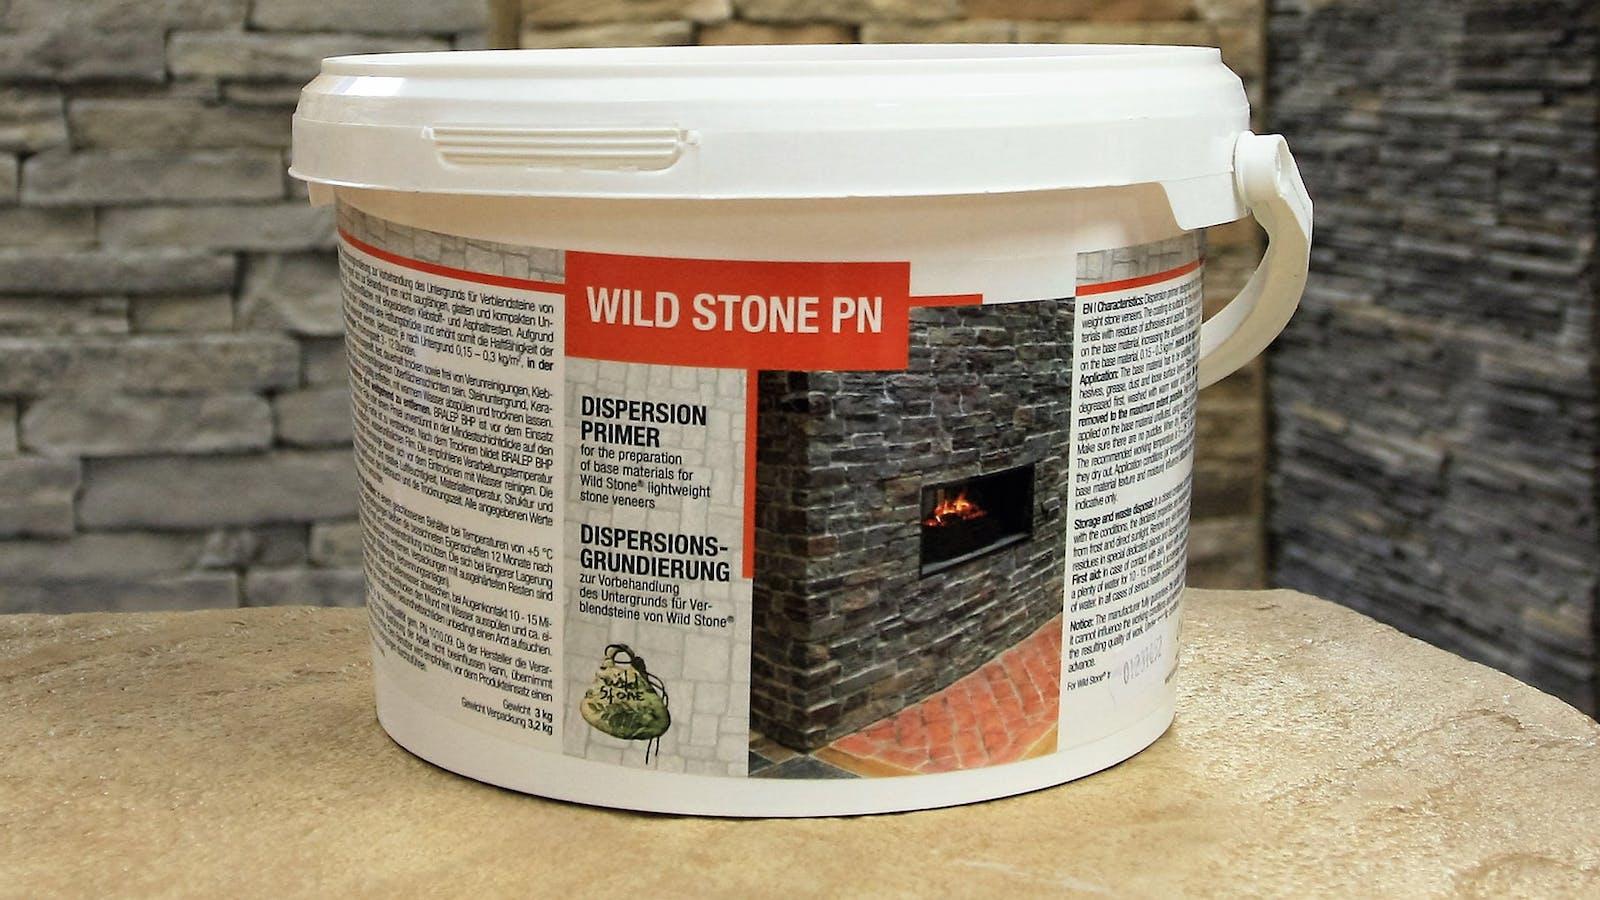 Wild Stone PN - Dispersion Primer